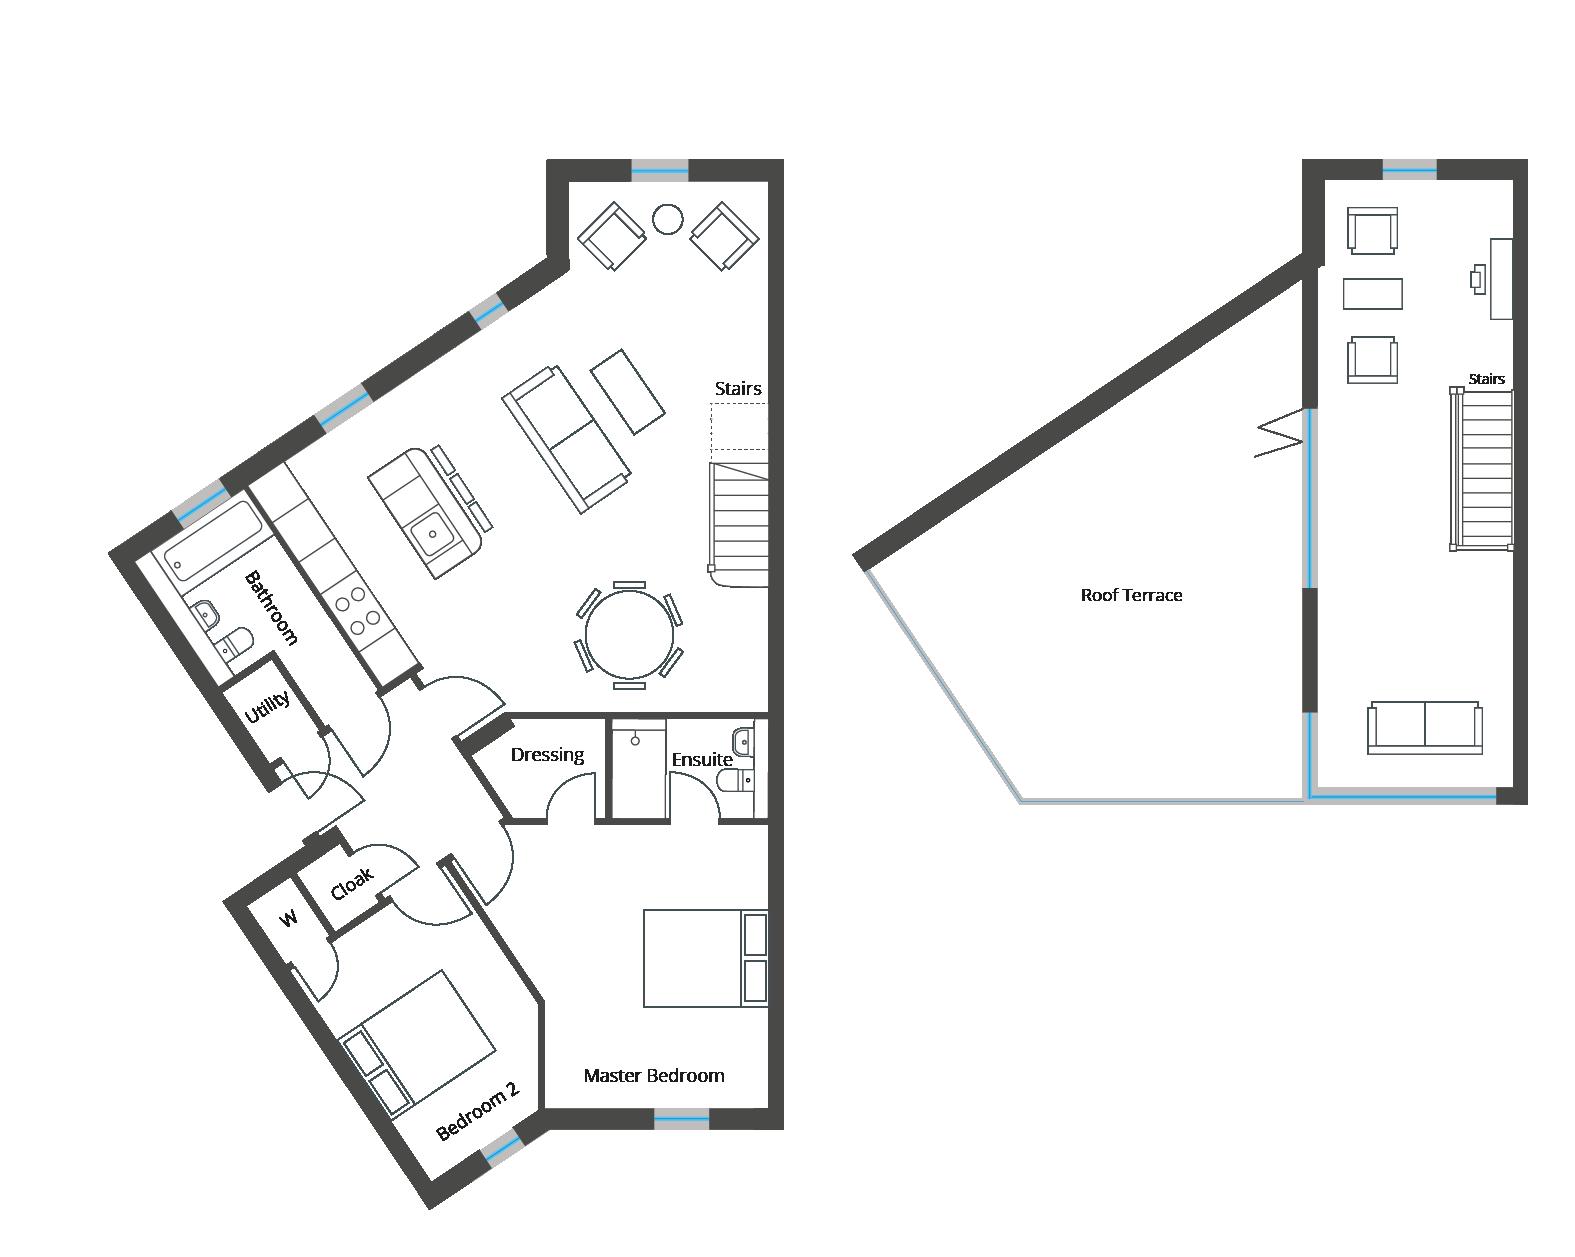 Floorplan for Apartment 8